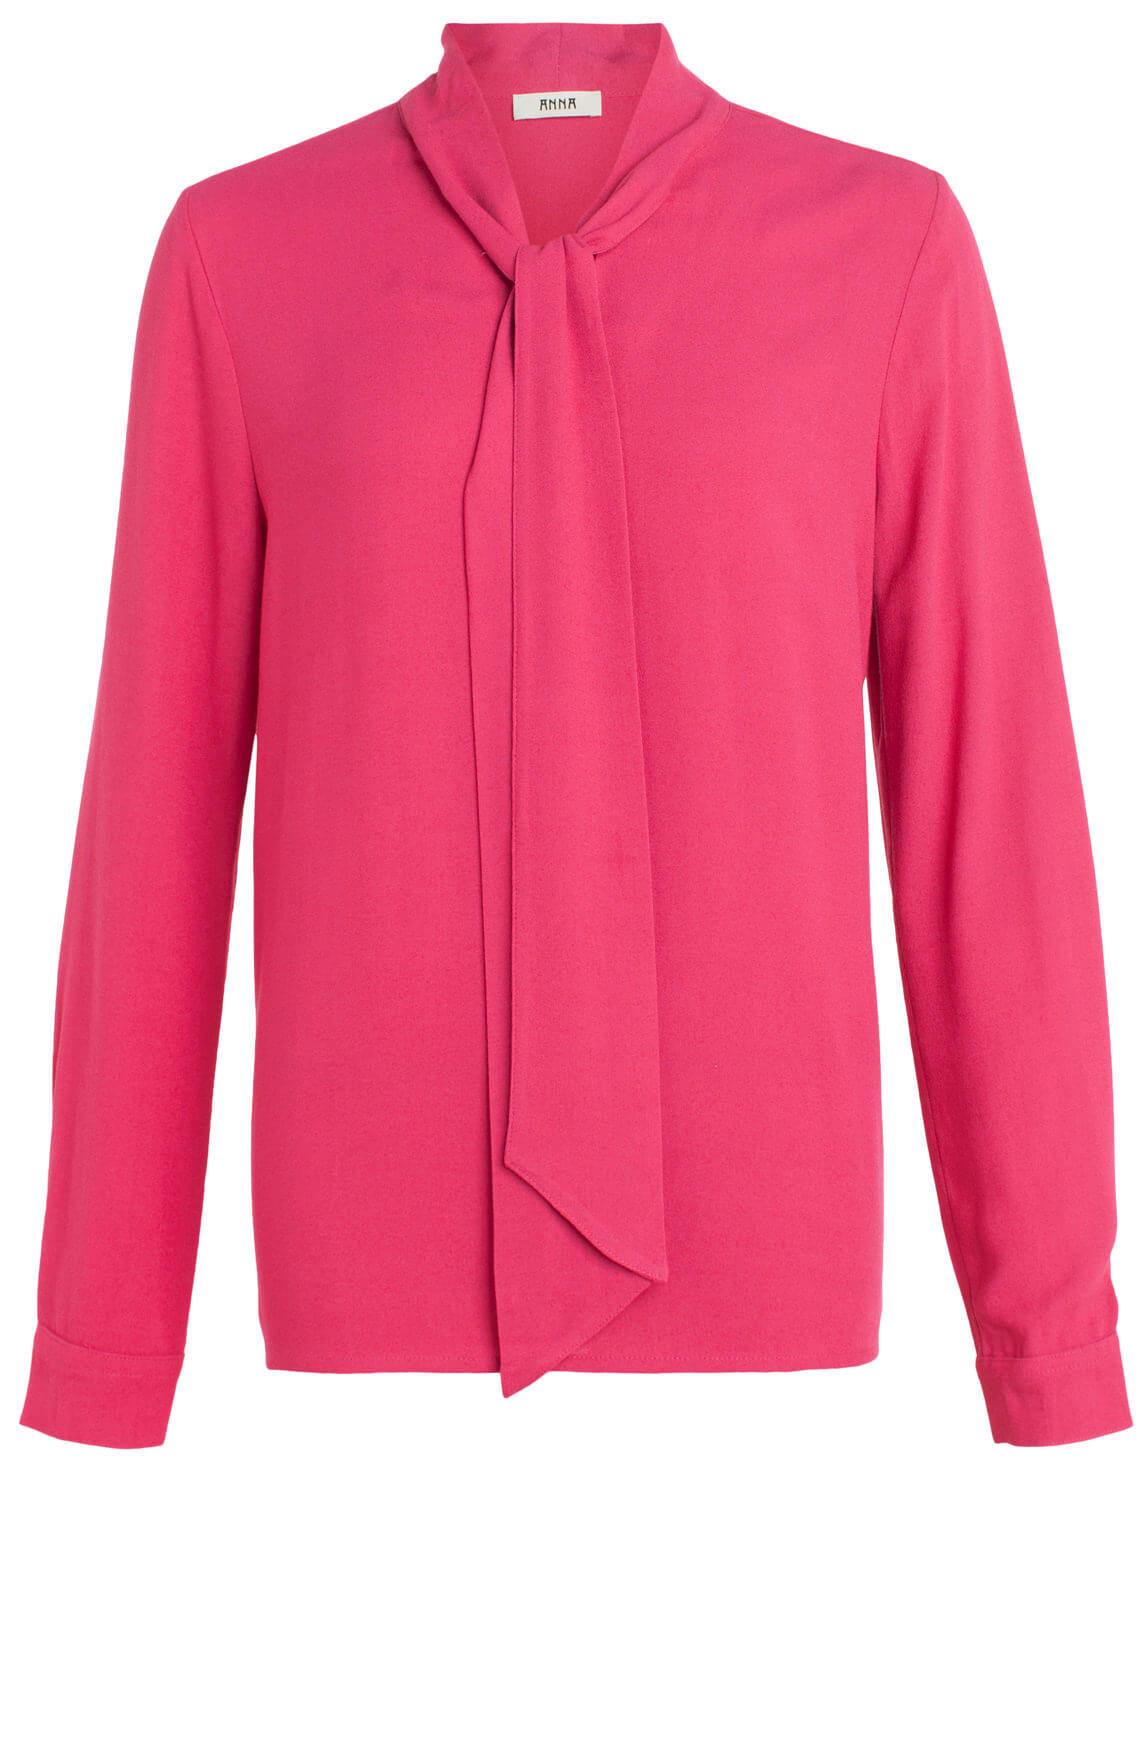 Anna Dames Blouse met striksluiting roze